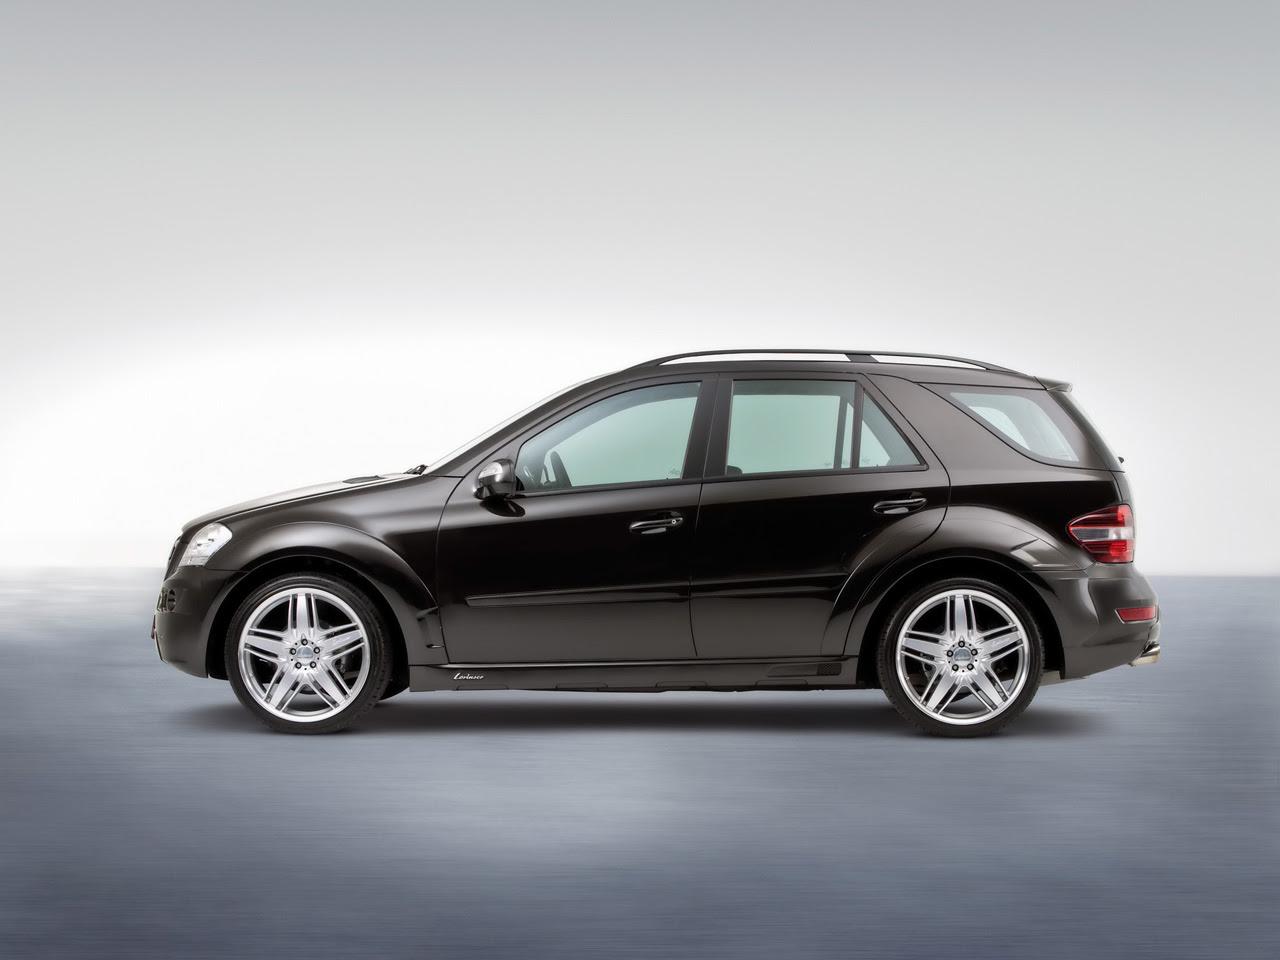 2010 Mercedes-Benz M-Class - Information and photos ...